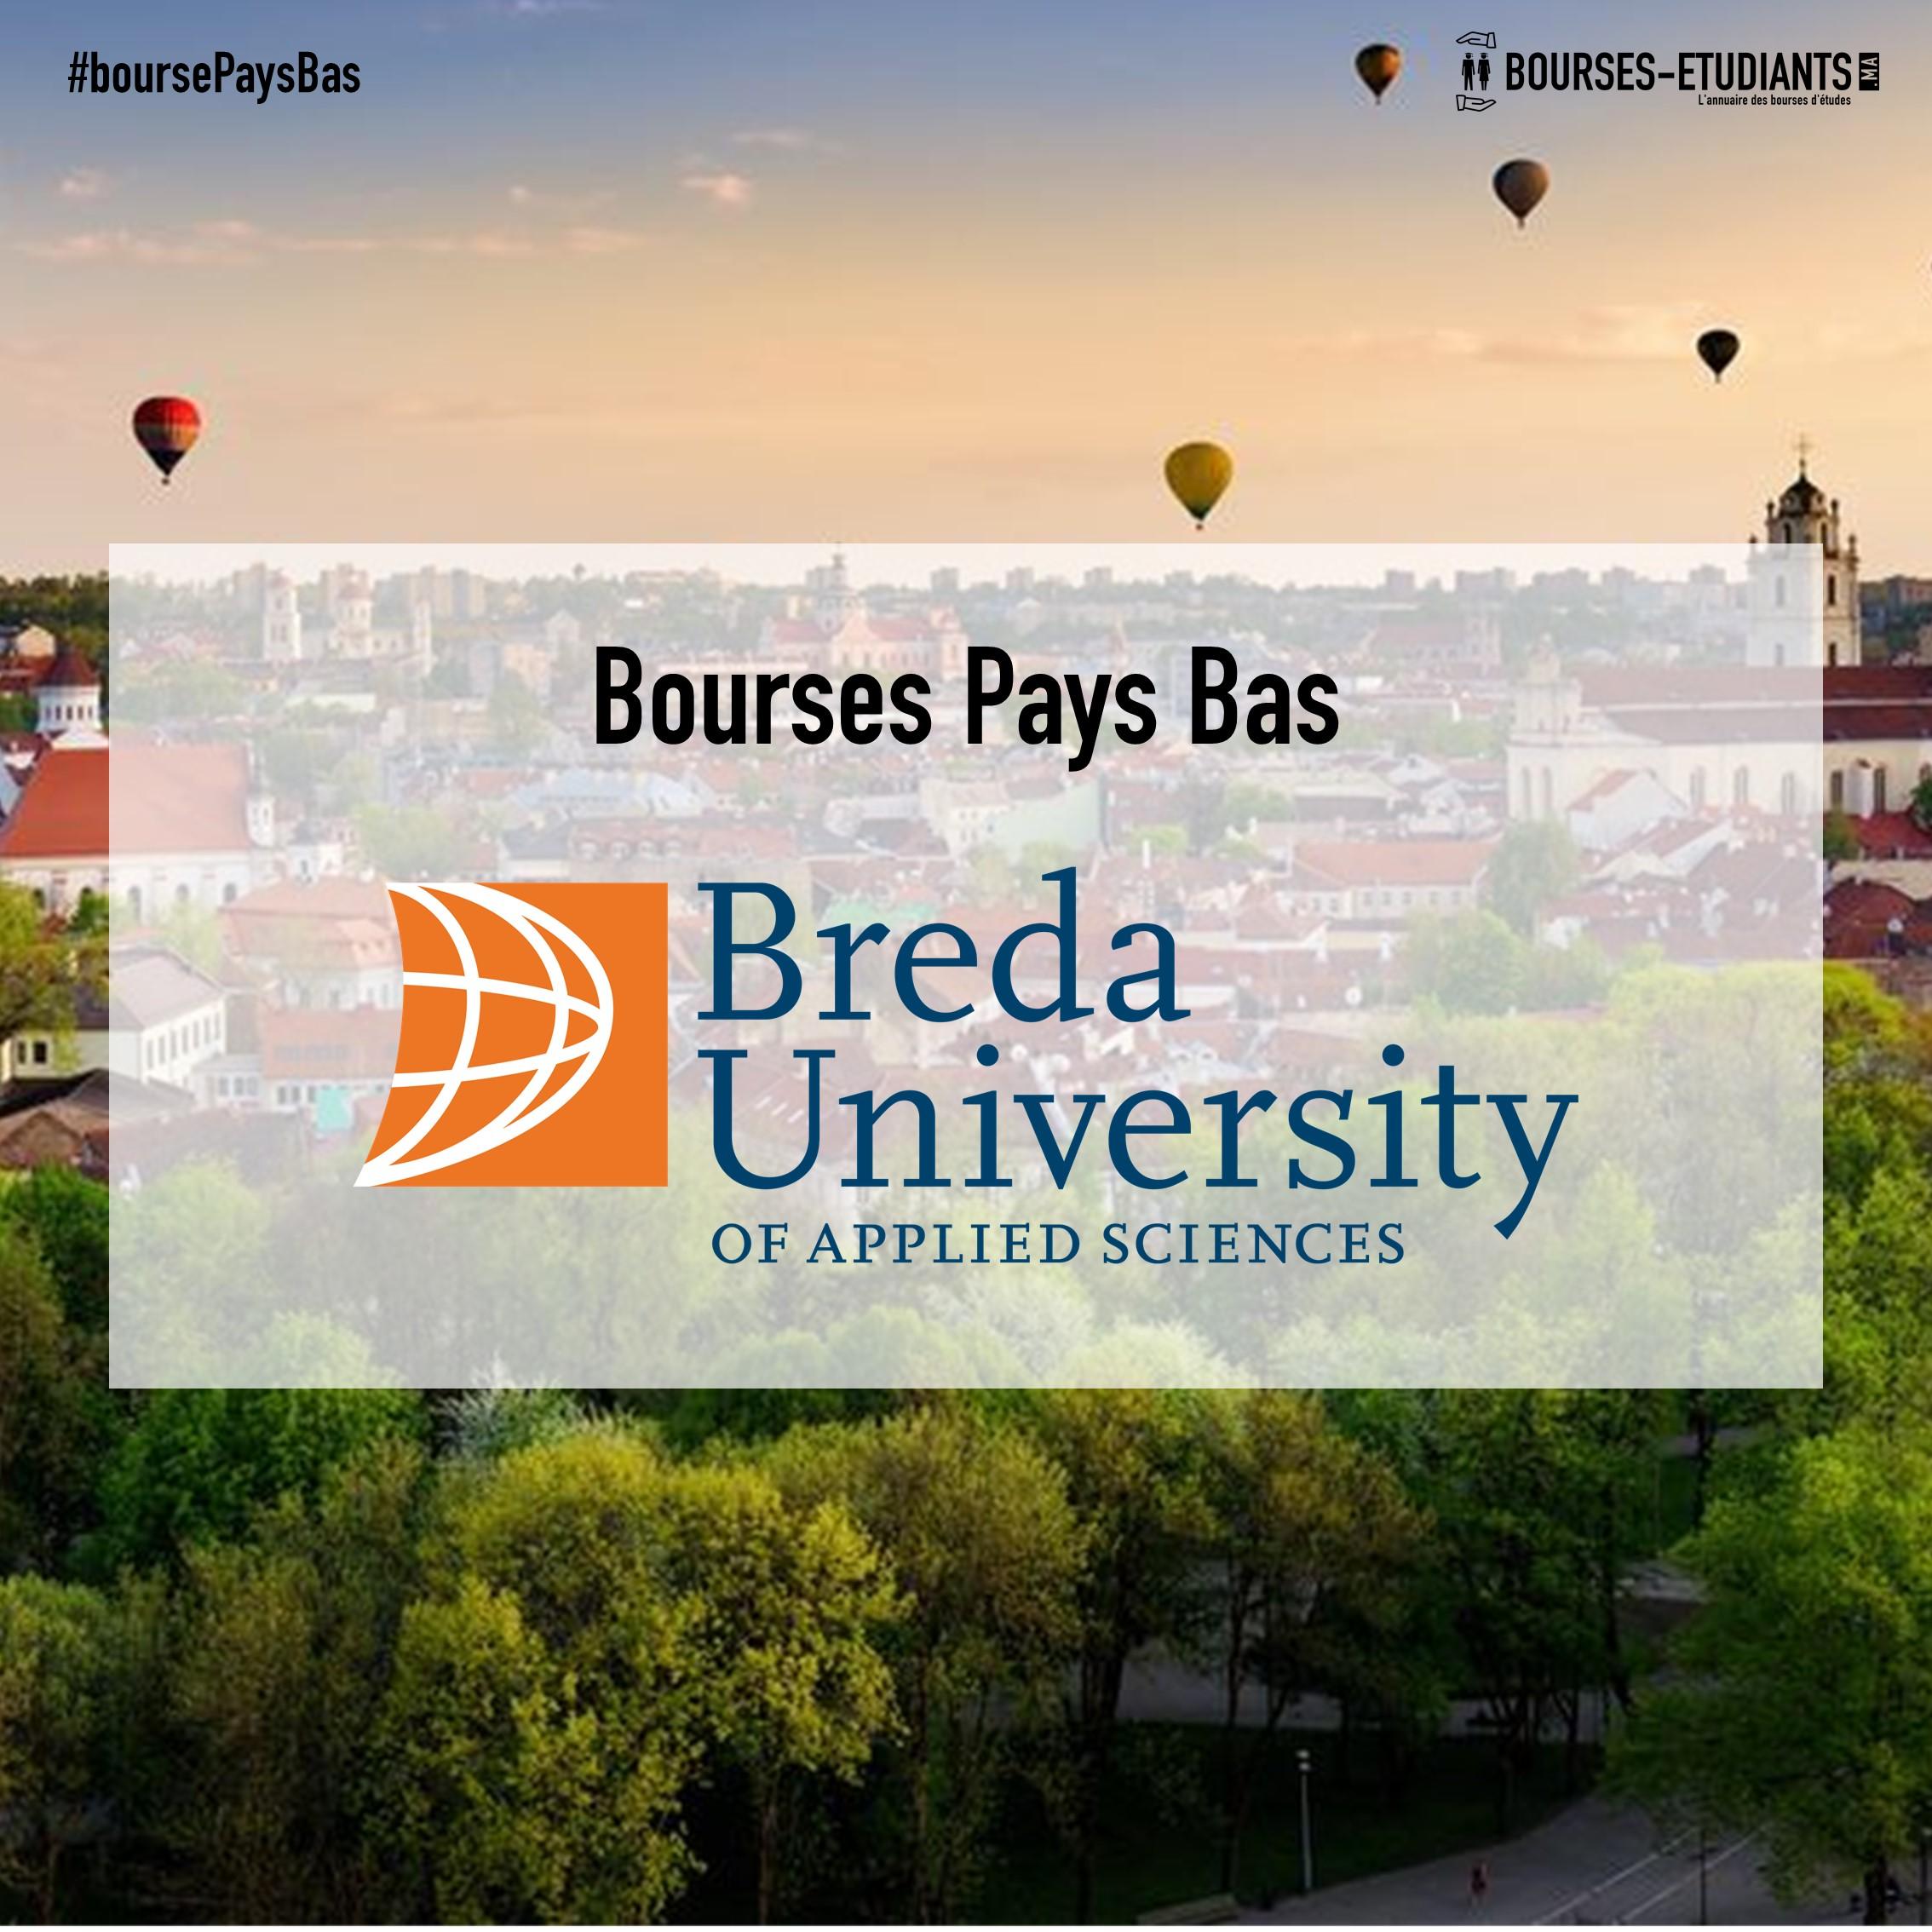 Bourses Pays Bas